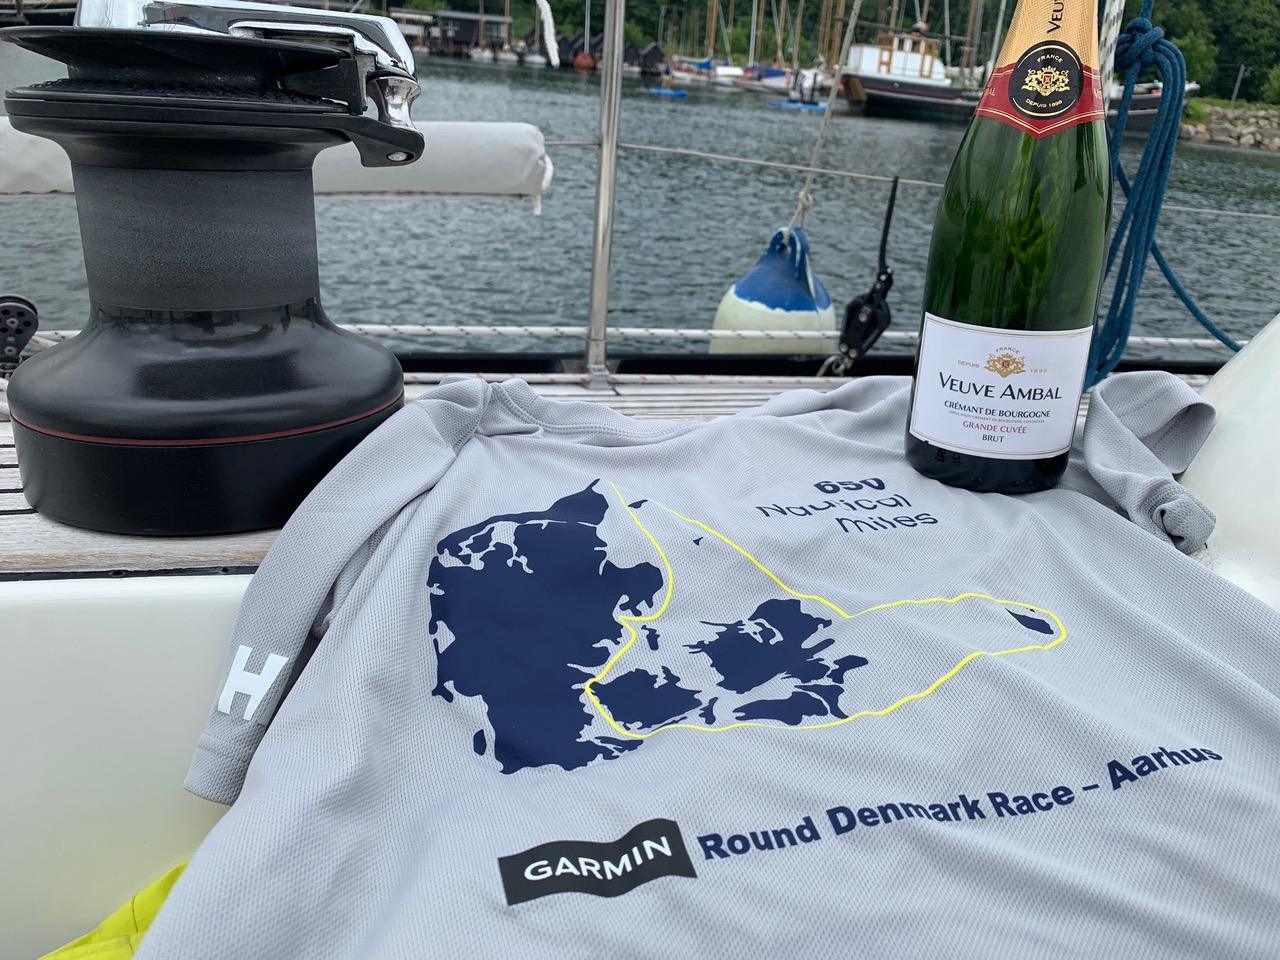 Round Denmark Race 2021 på Xusidus